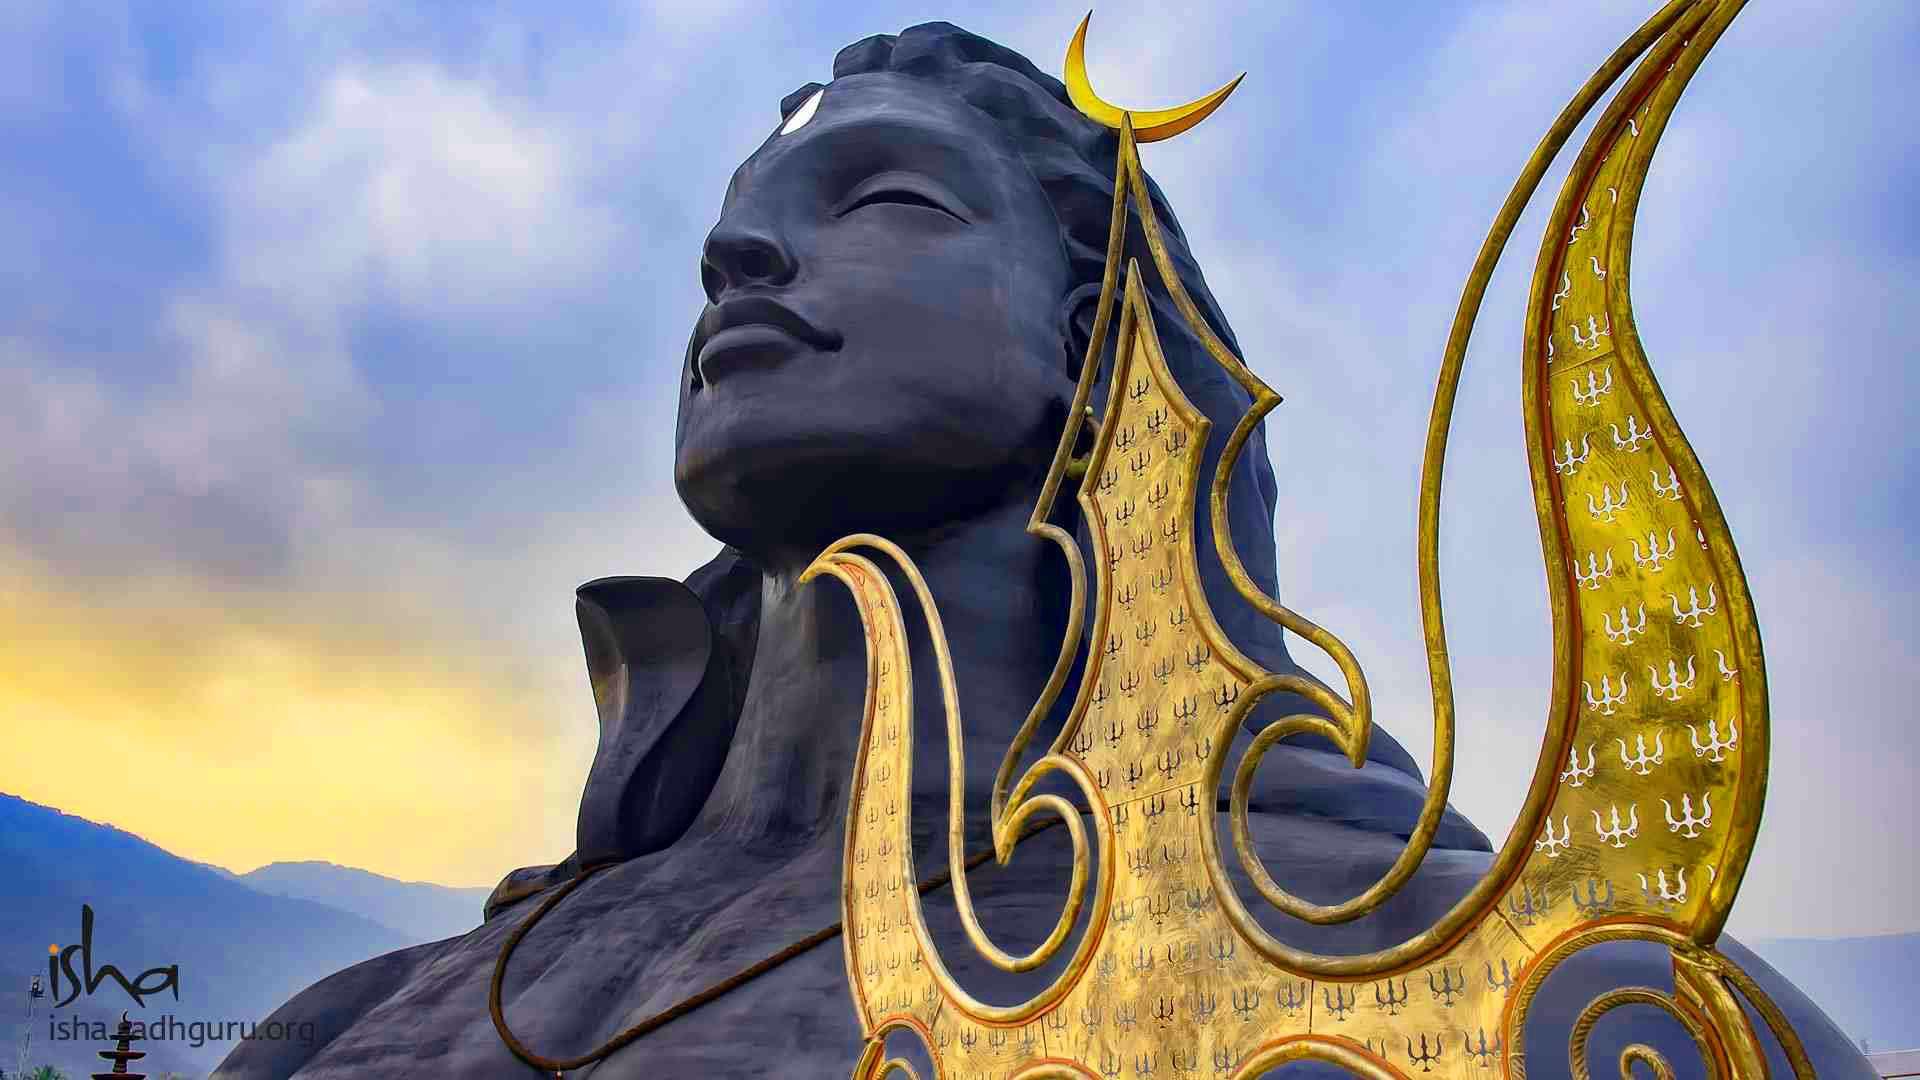 Beautiful Shiva Images photo pics for whatsapp